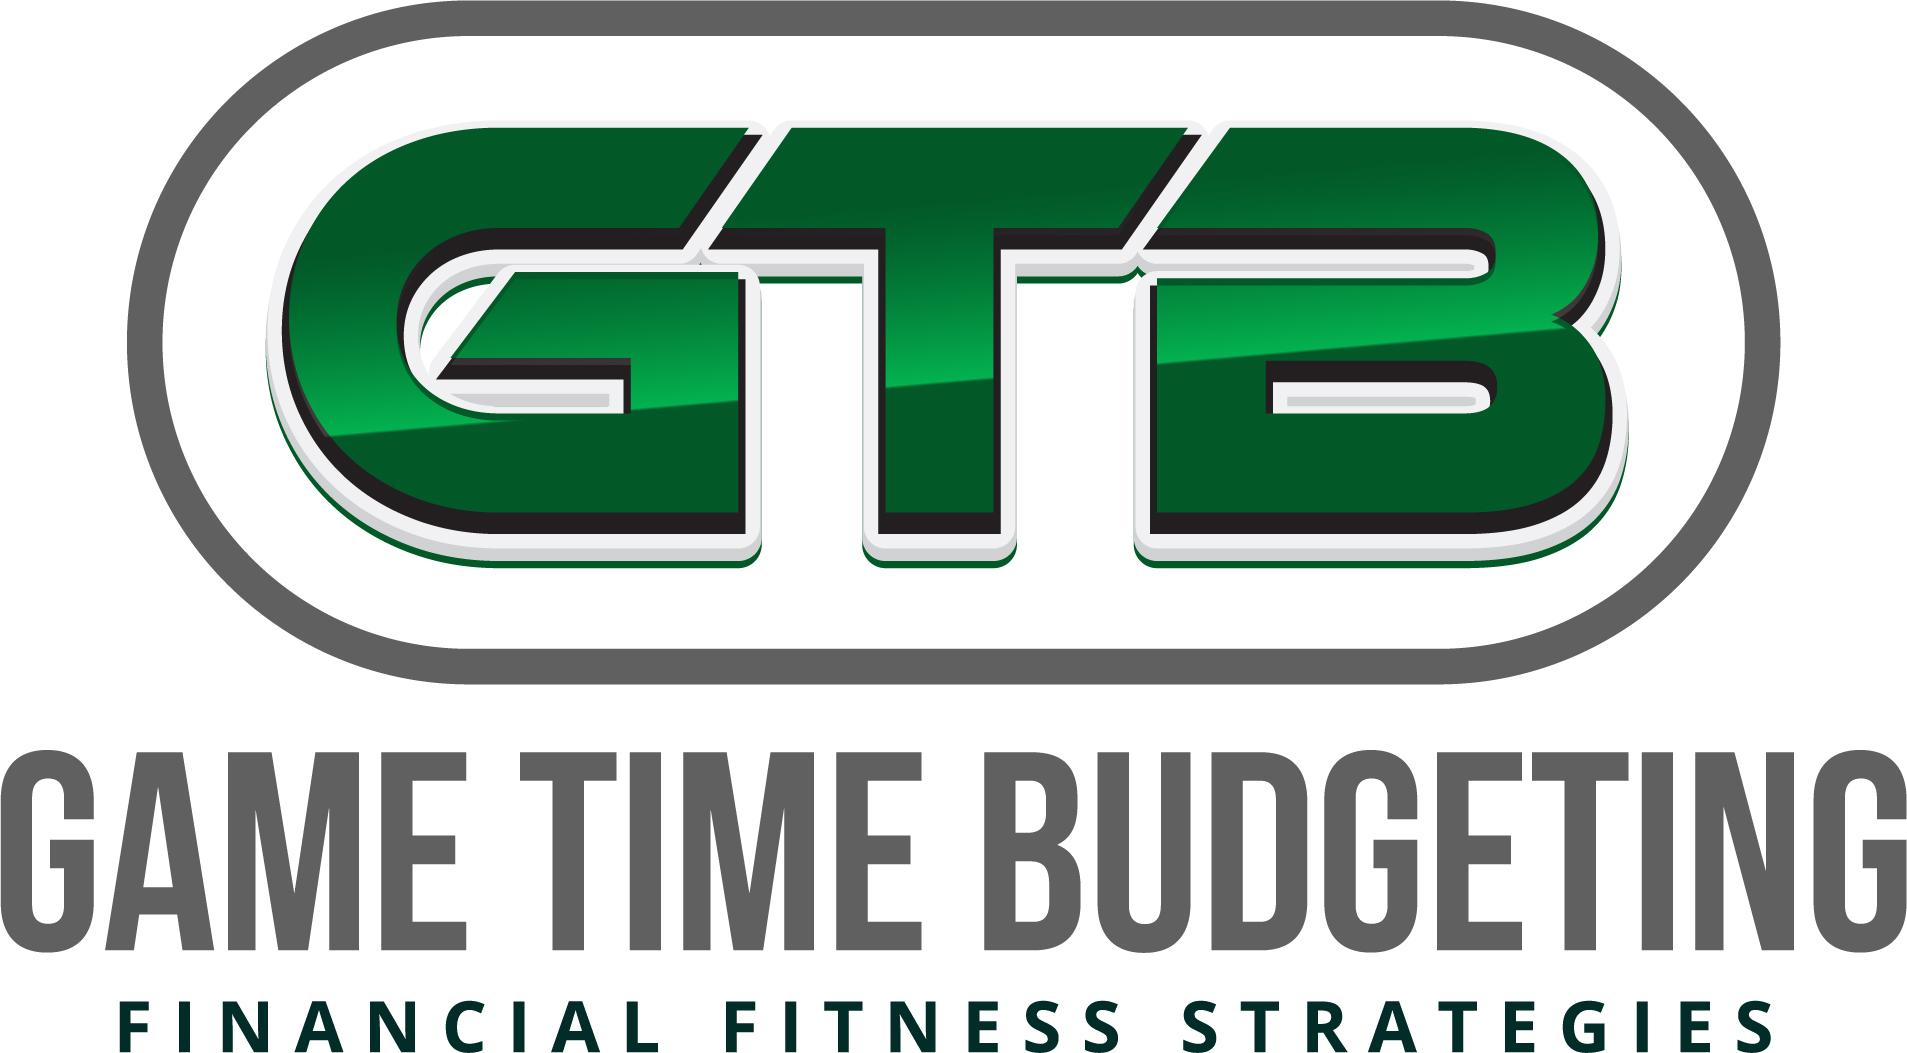 Game Time Budgeting_FinalFiles_JPG.JPG